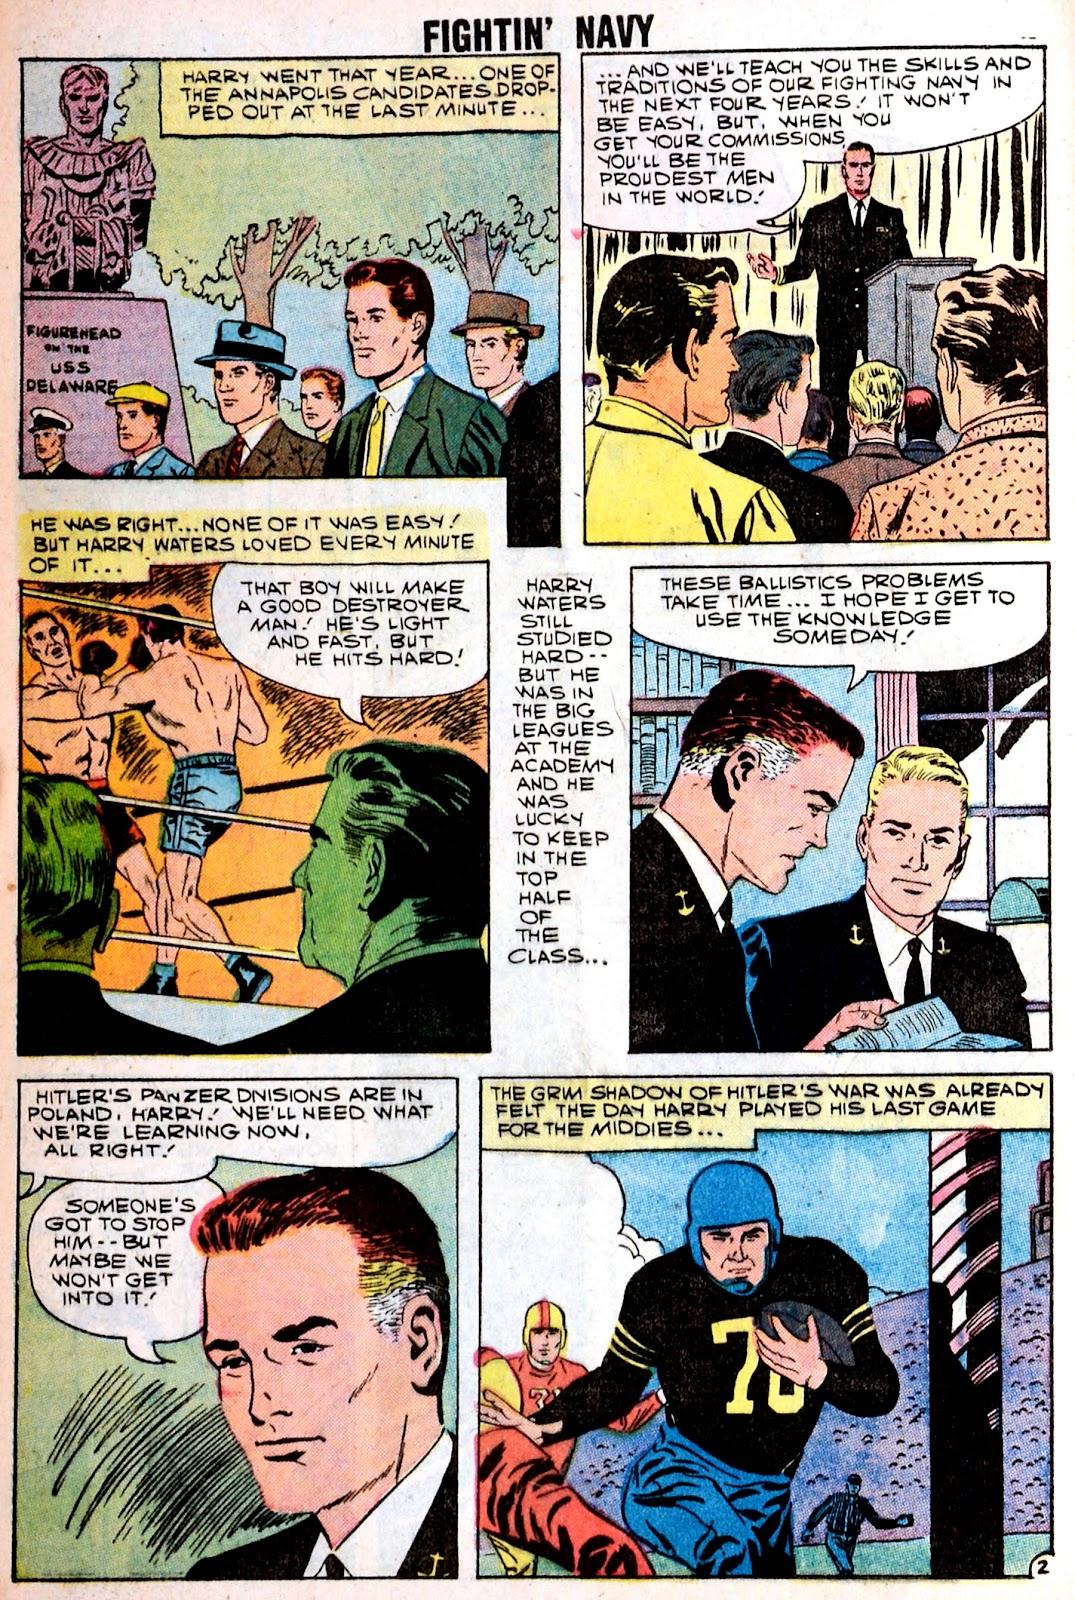 Read online Fightin' Navy comic -  Issue #85 - 4